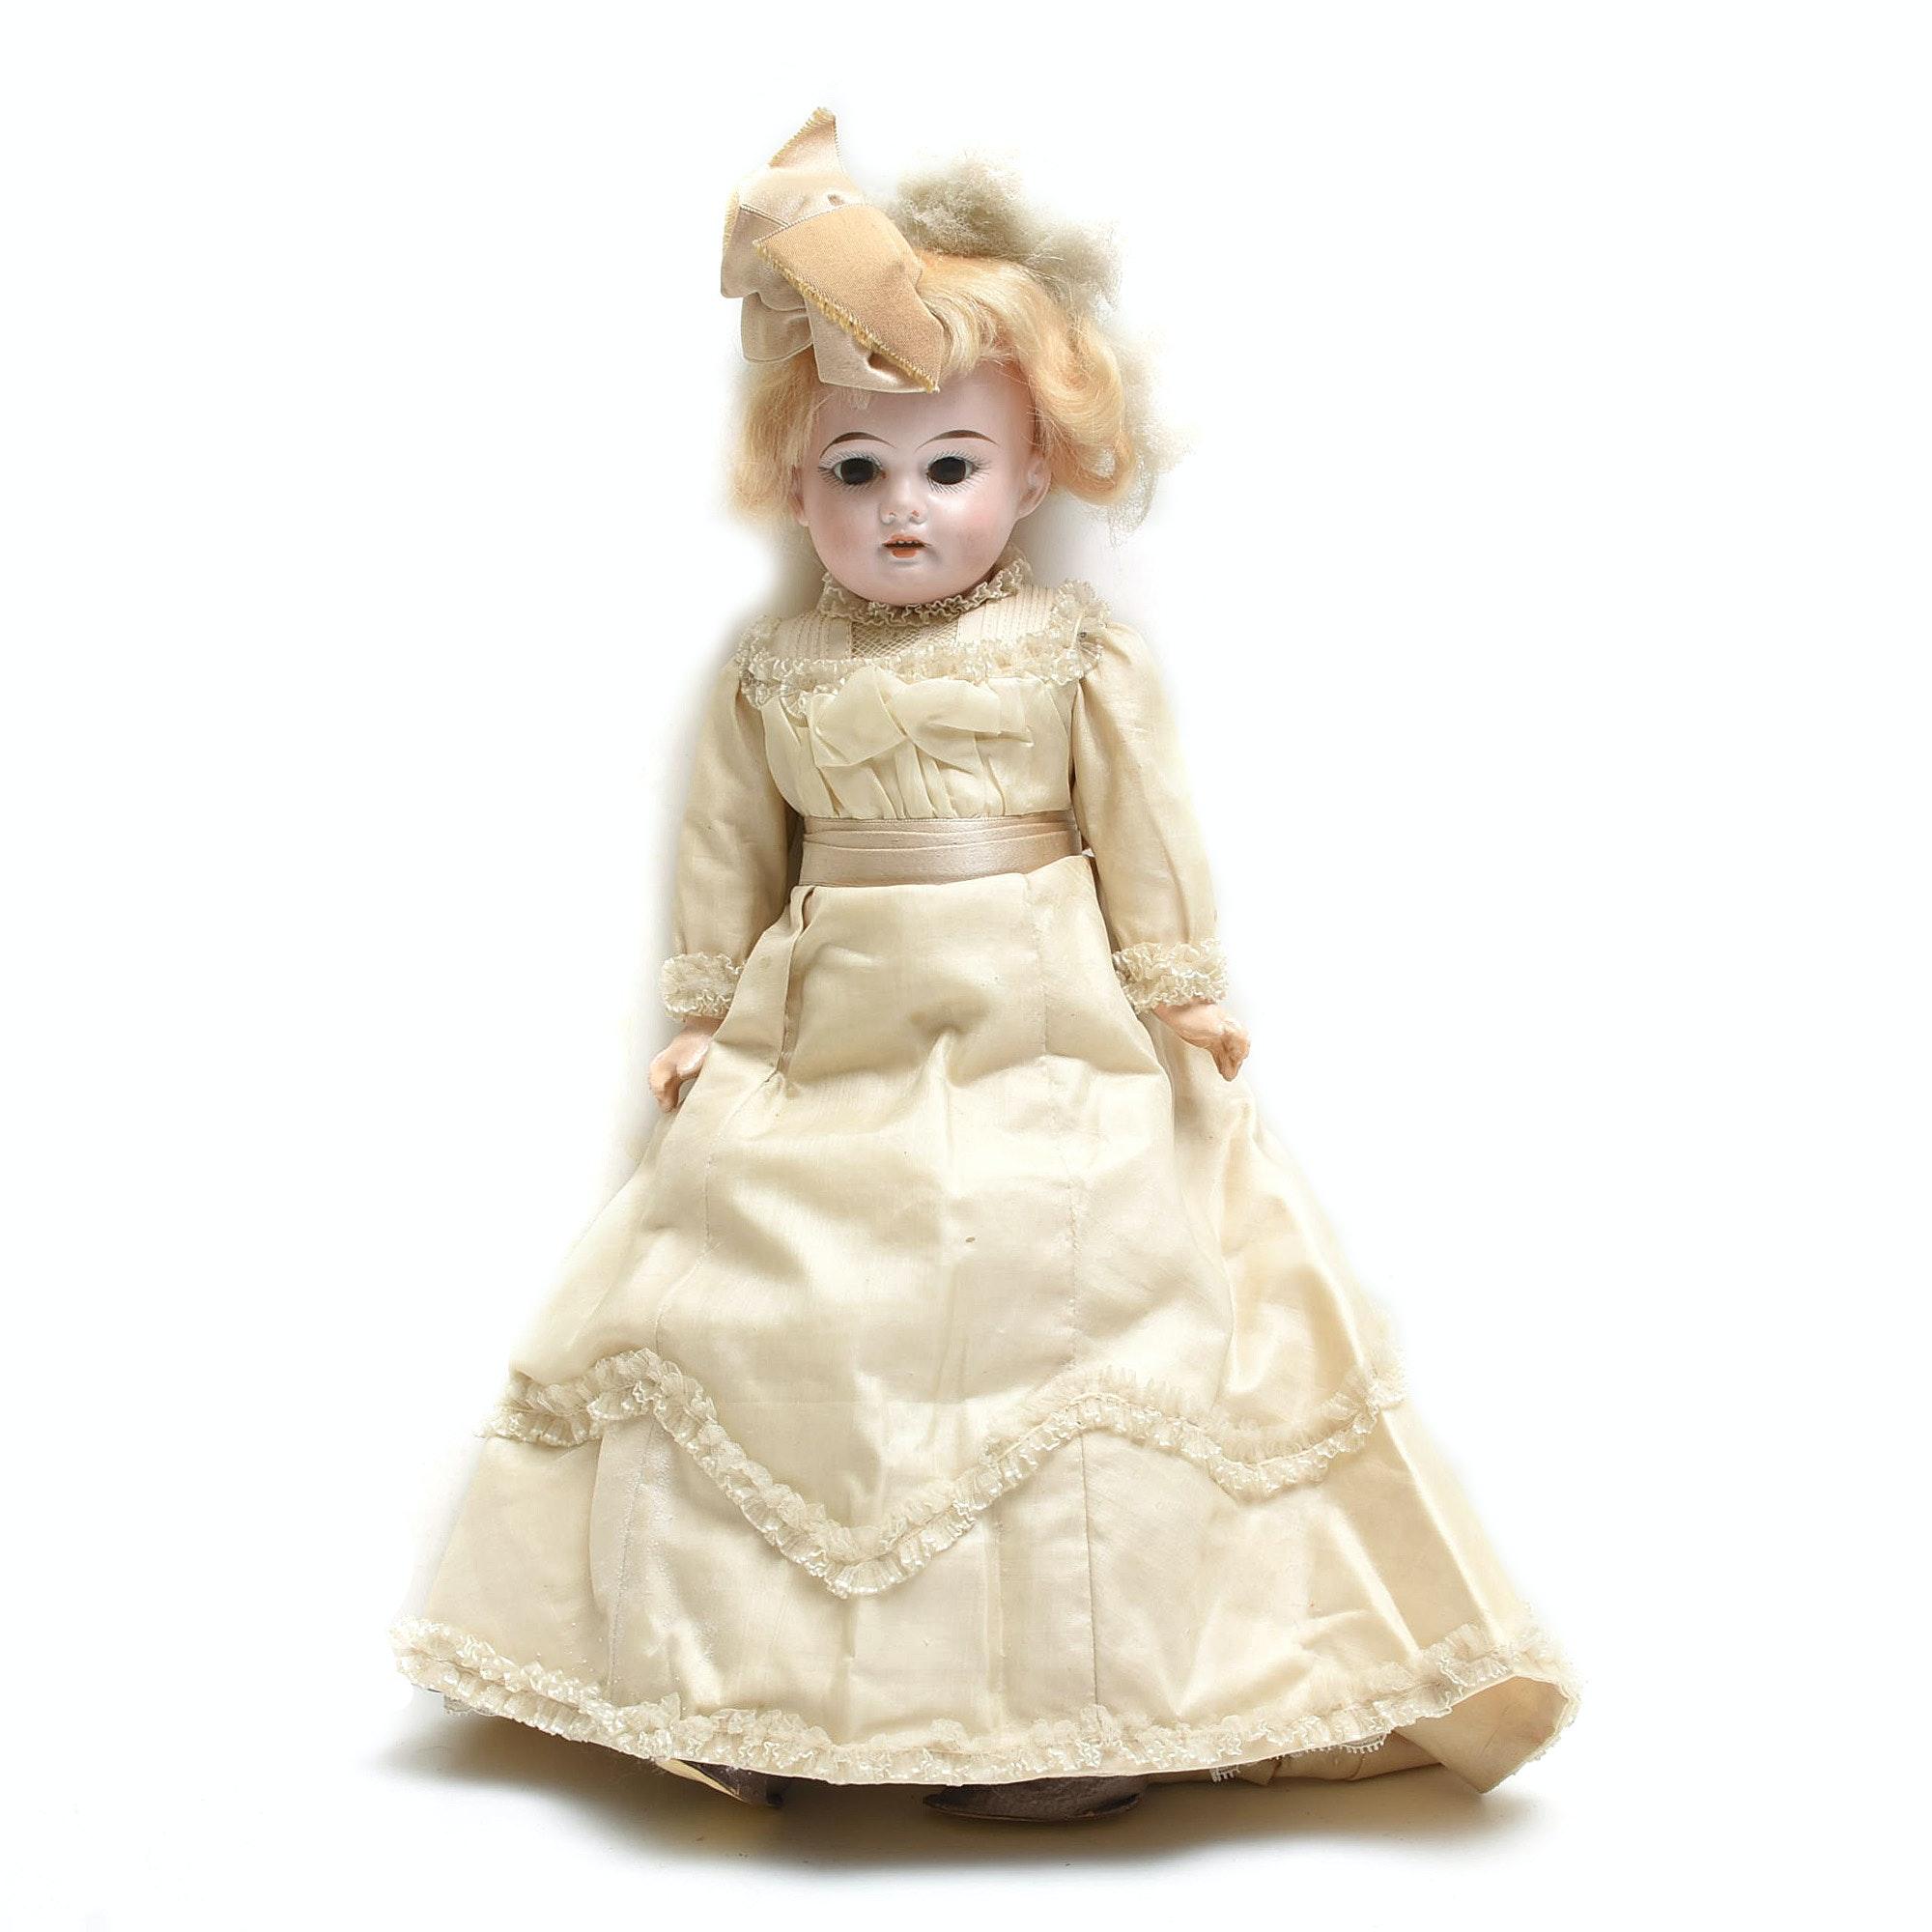 Antique Armand Marseille Bisque Head Doll